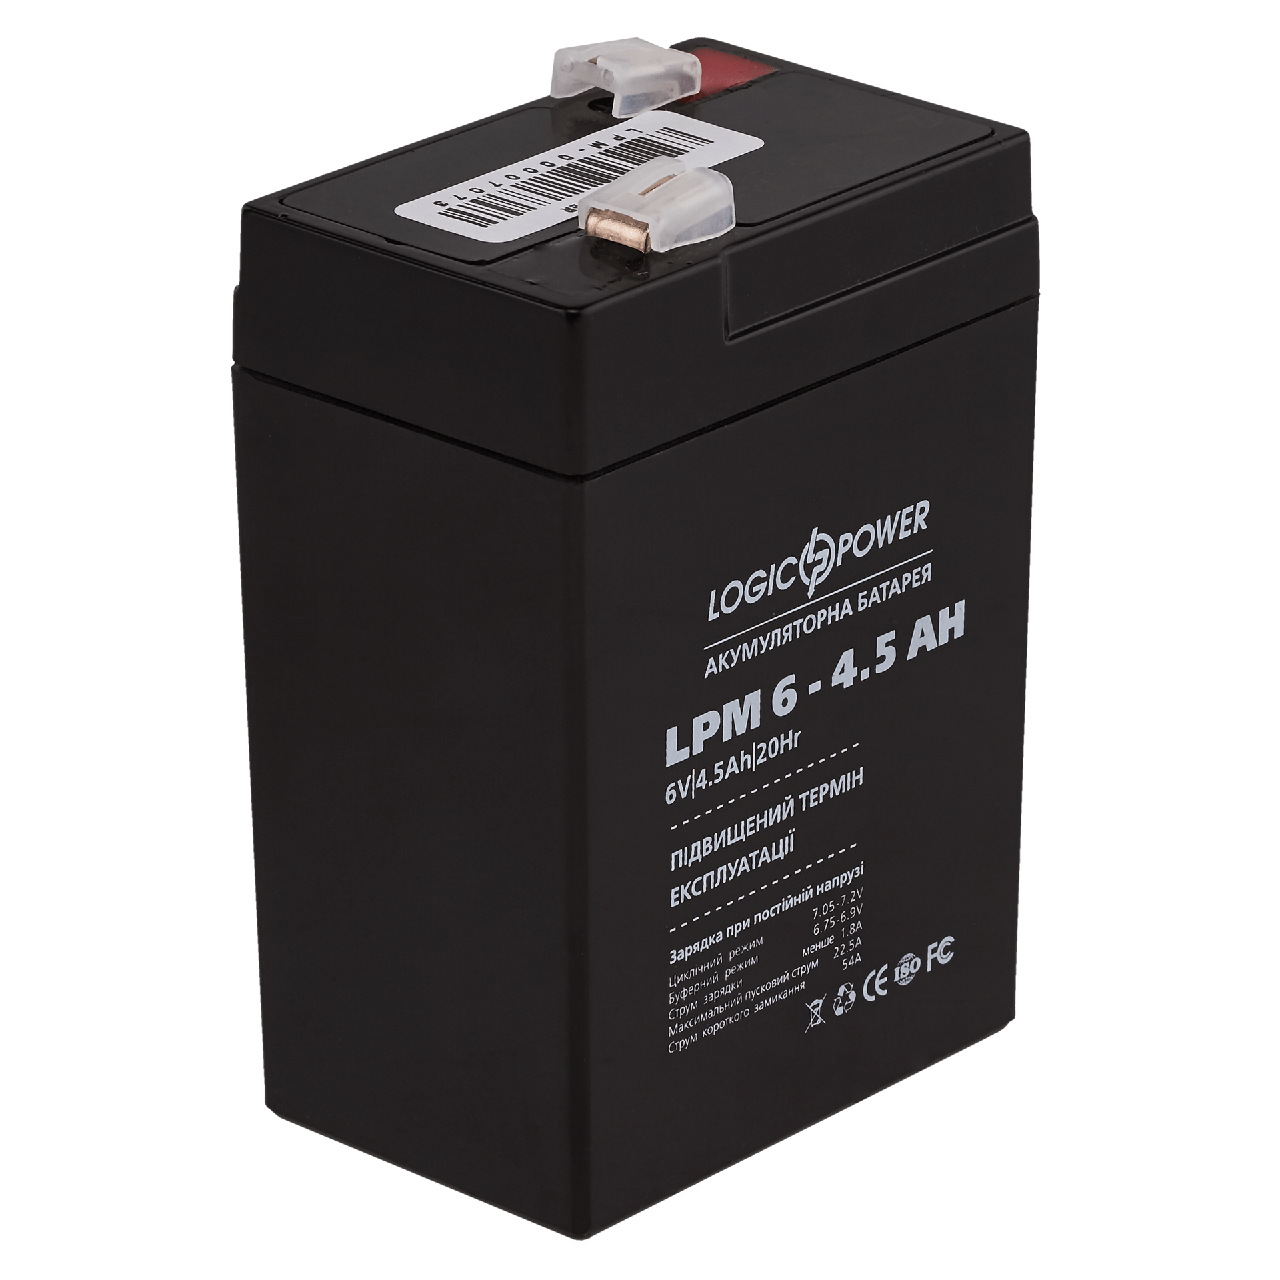 Аккумулятор LogicPower LPM 6 - 4.5AH